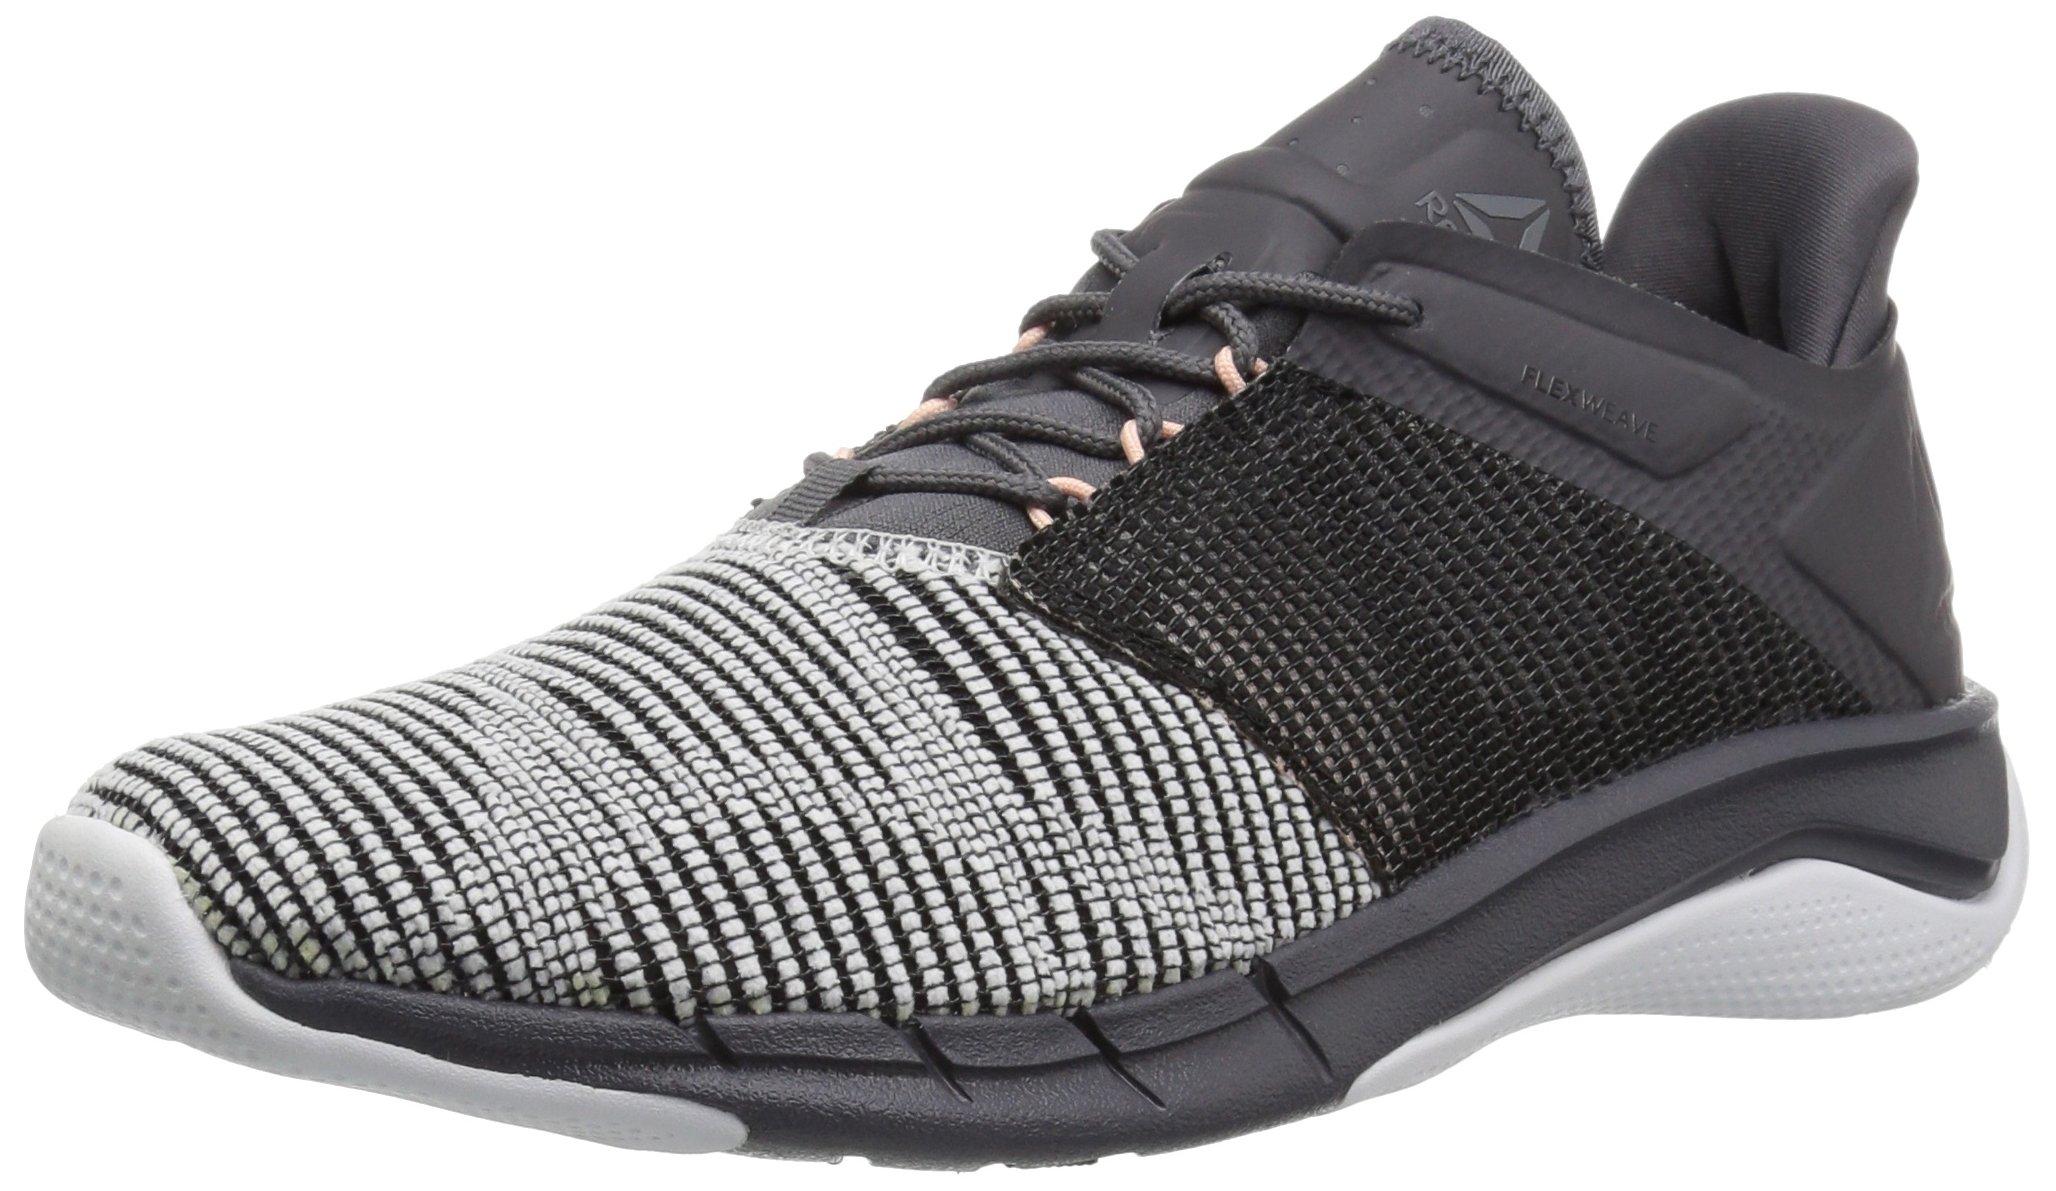 Reebok Women's Fast Flexweave Running Shoe, White/Ash Grey/Black/Desert Dust, 8.5 M US